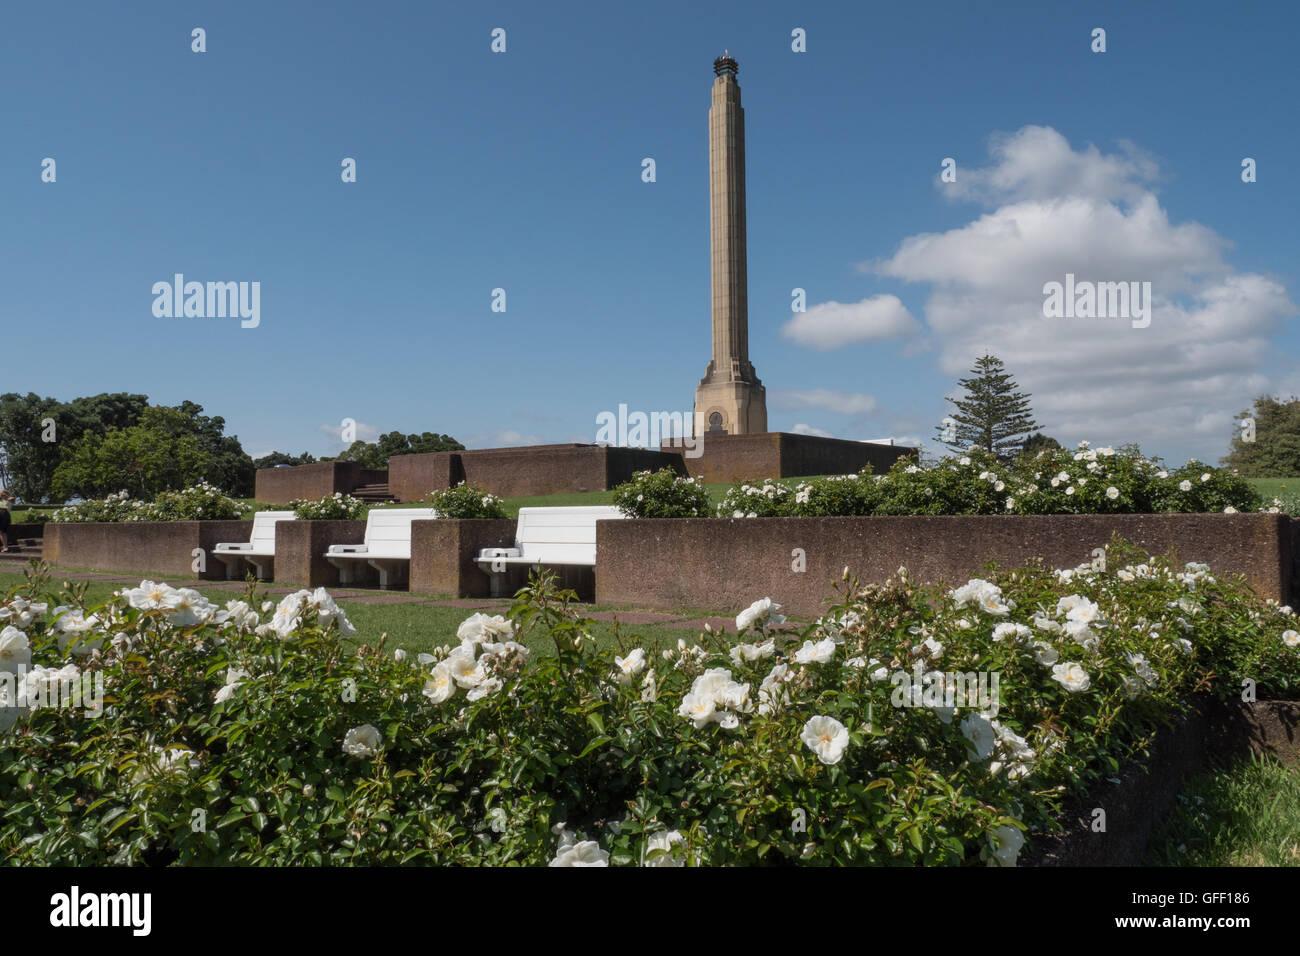 Michael Joseph Savage memorial, Orakei memorial park, Bastion Point, Auckland, New Zealand. - Stock Image